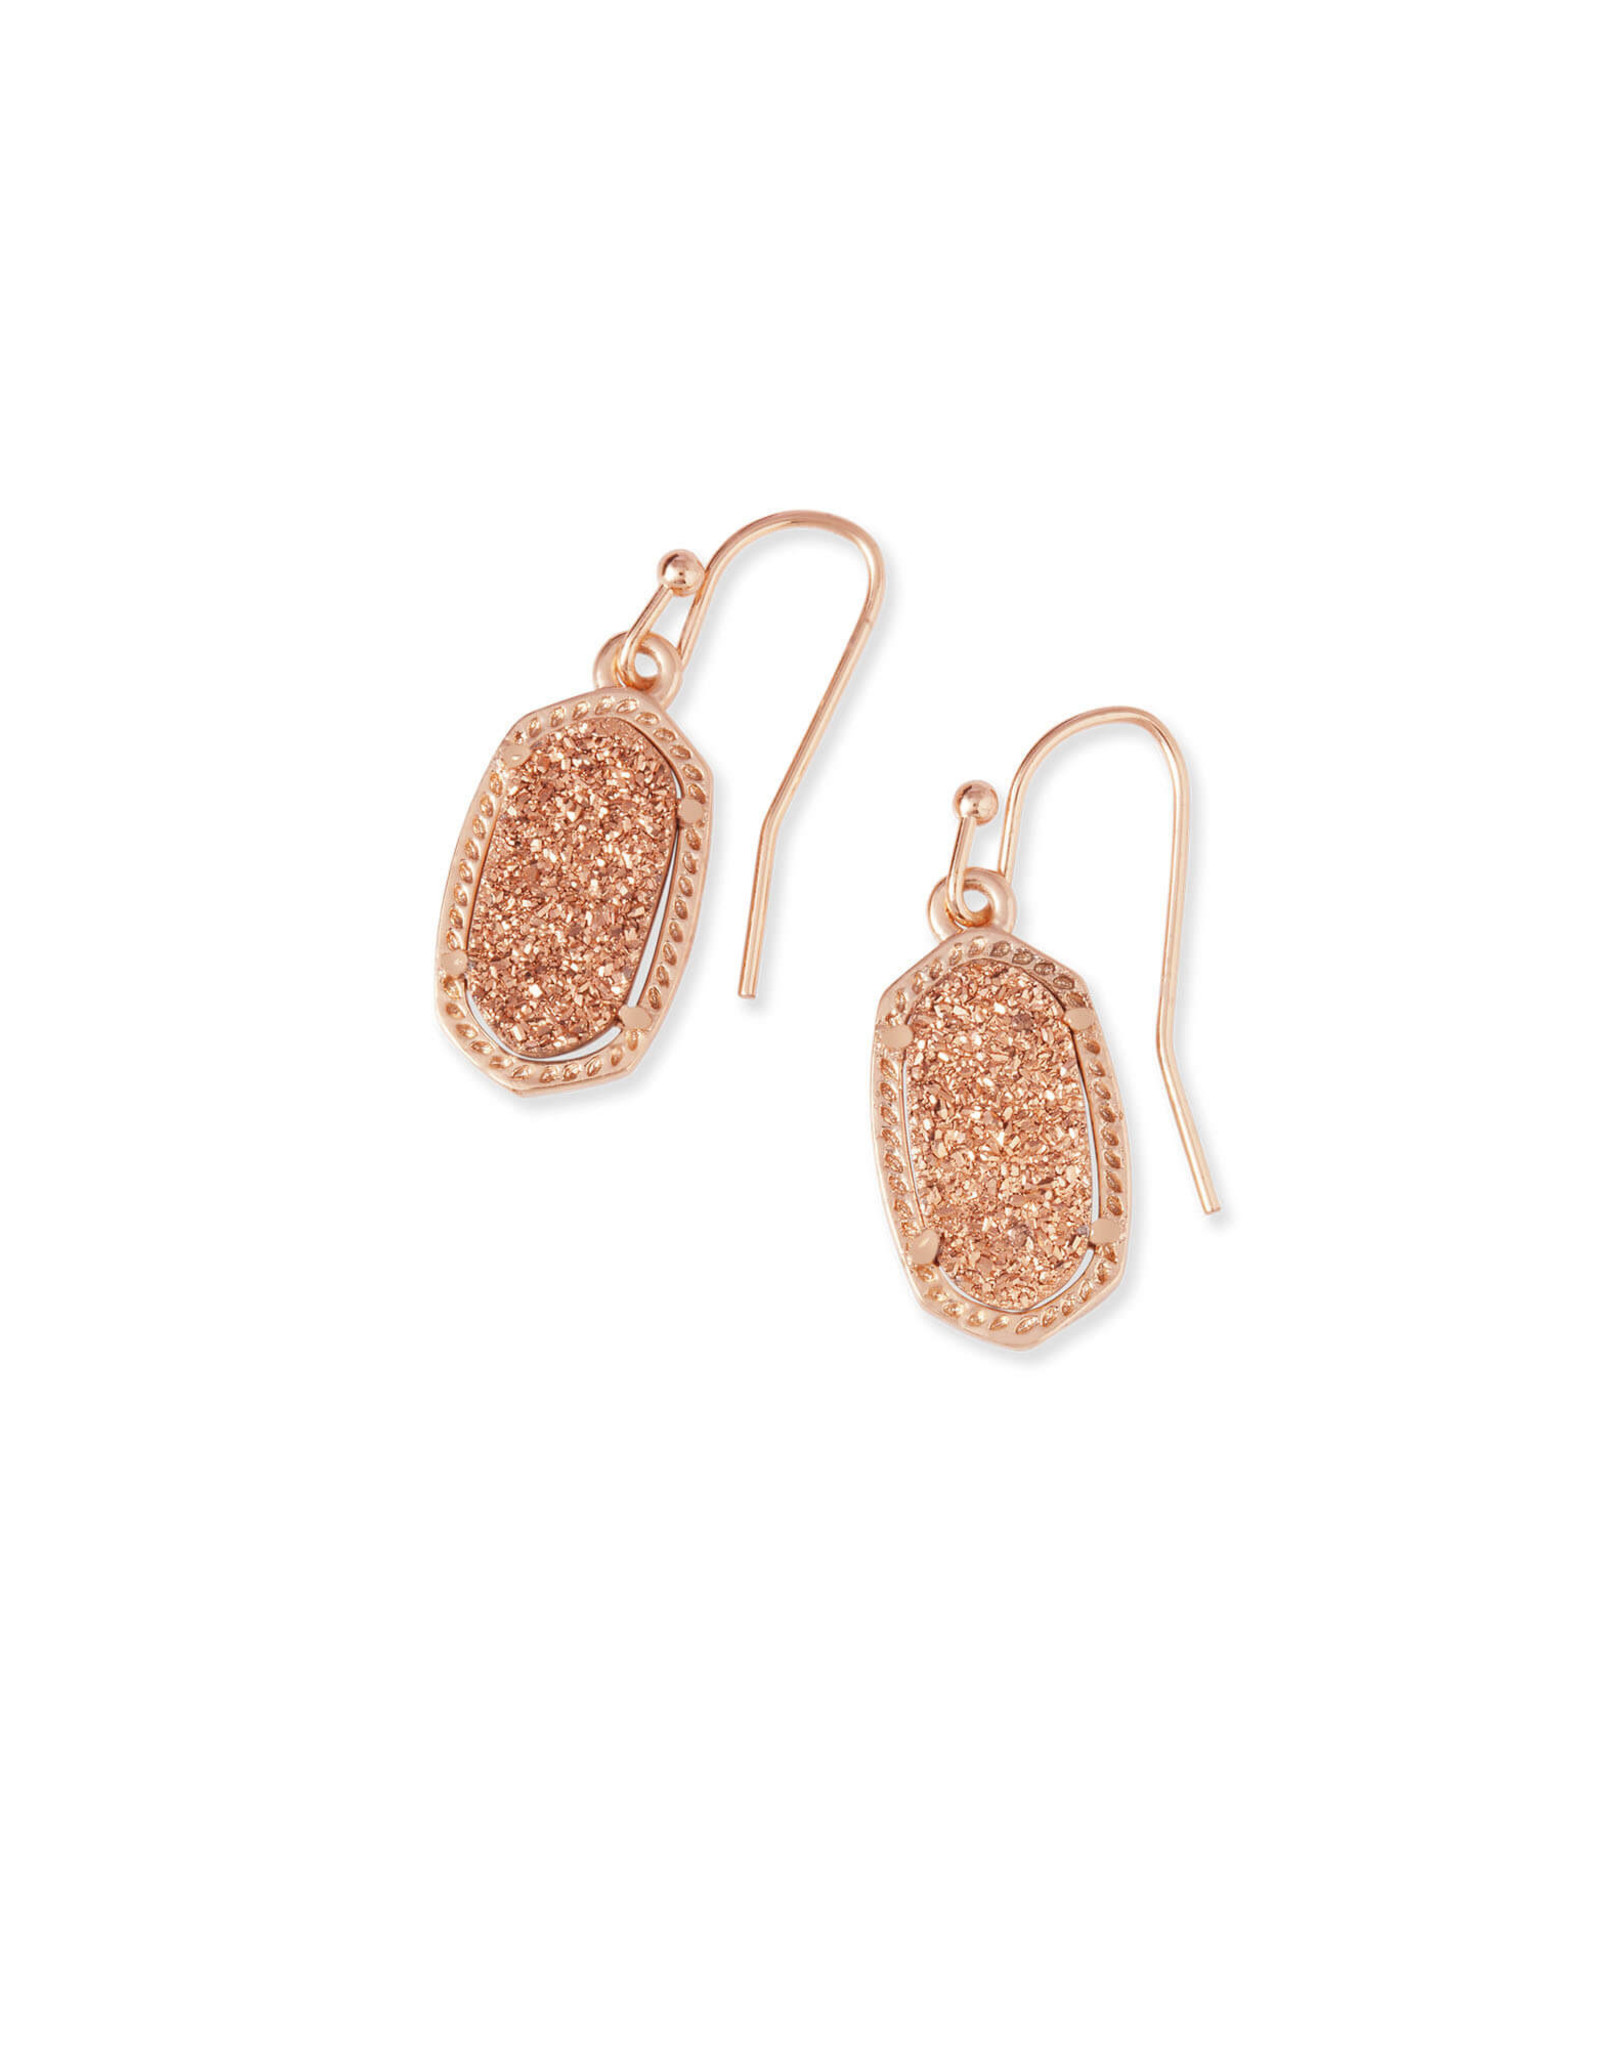 Kendra Scott Lee Earring - Rose Gold Drusy/Rose Gold